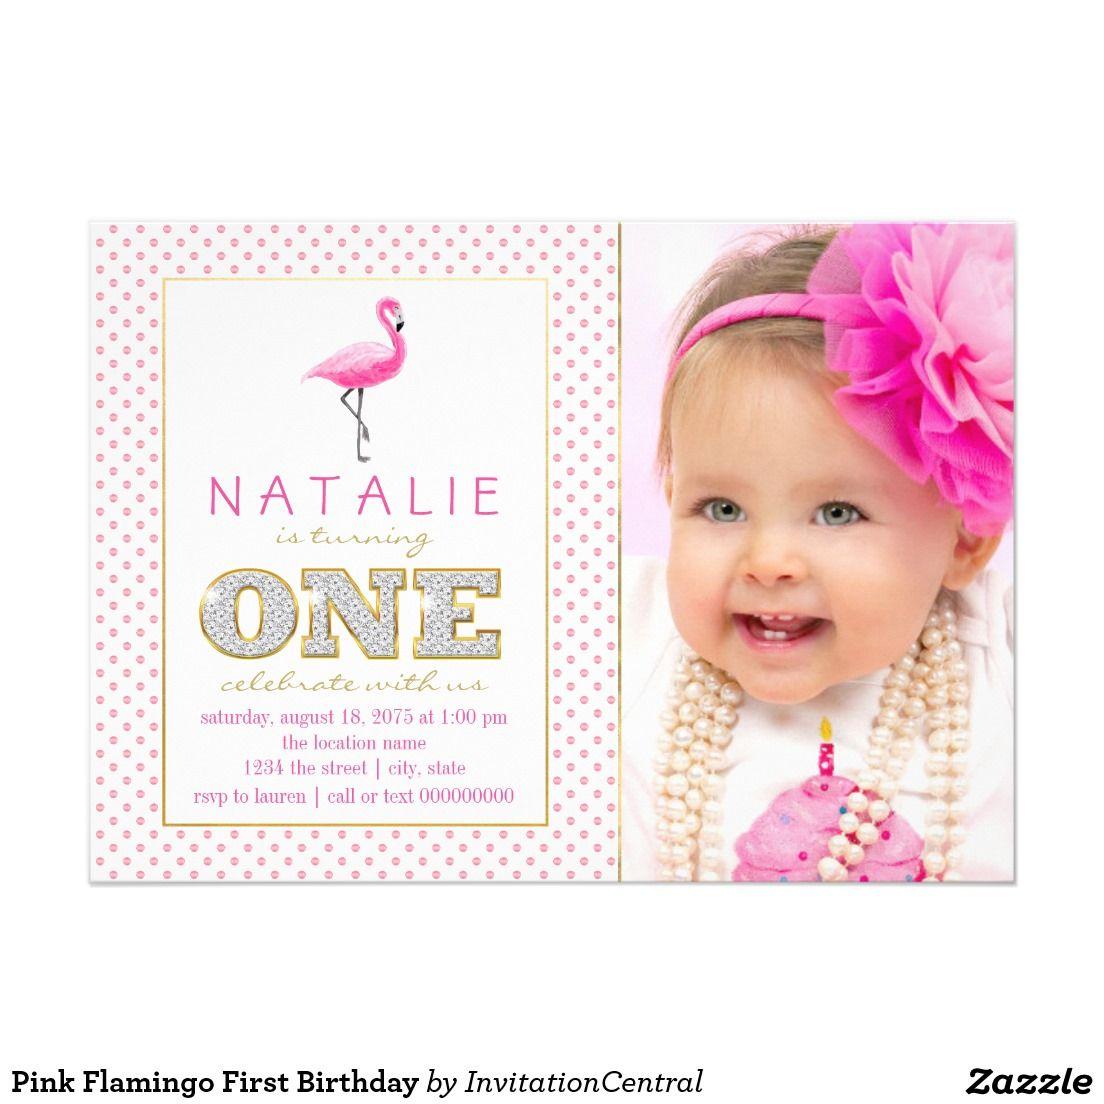 Pink Flamingo First Birthday Card | First Birthday Invitations Ideas ...